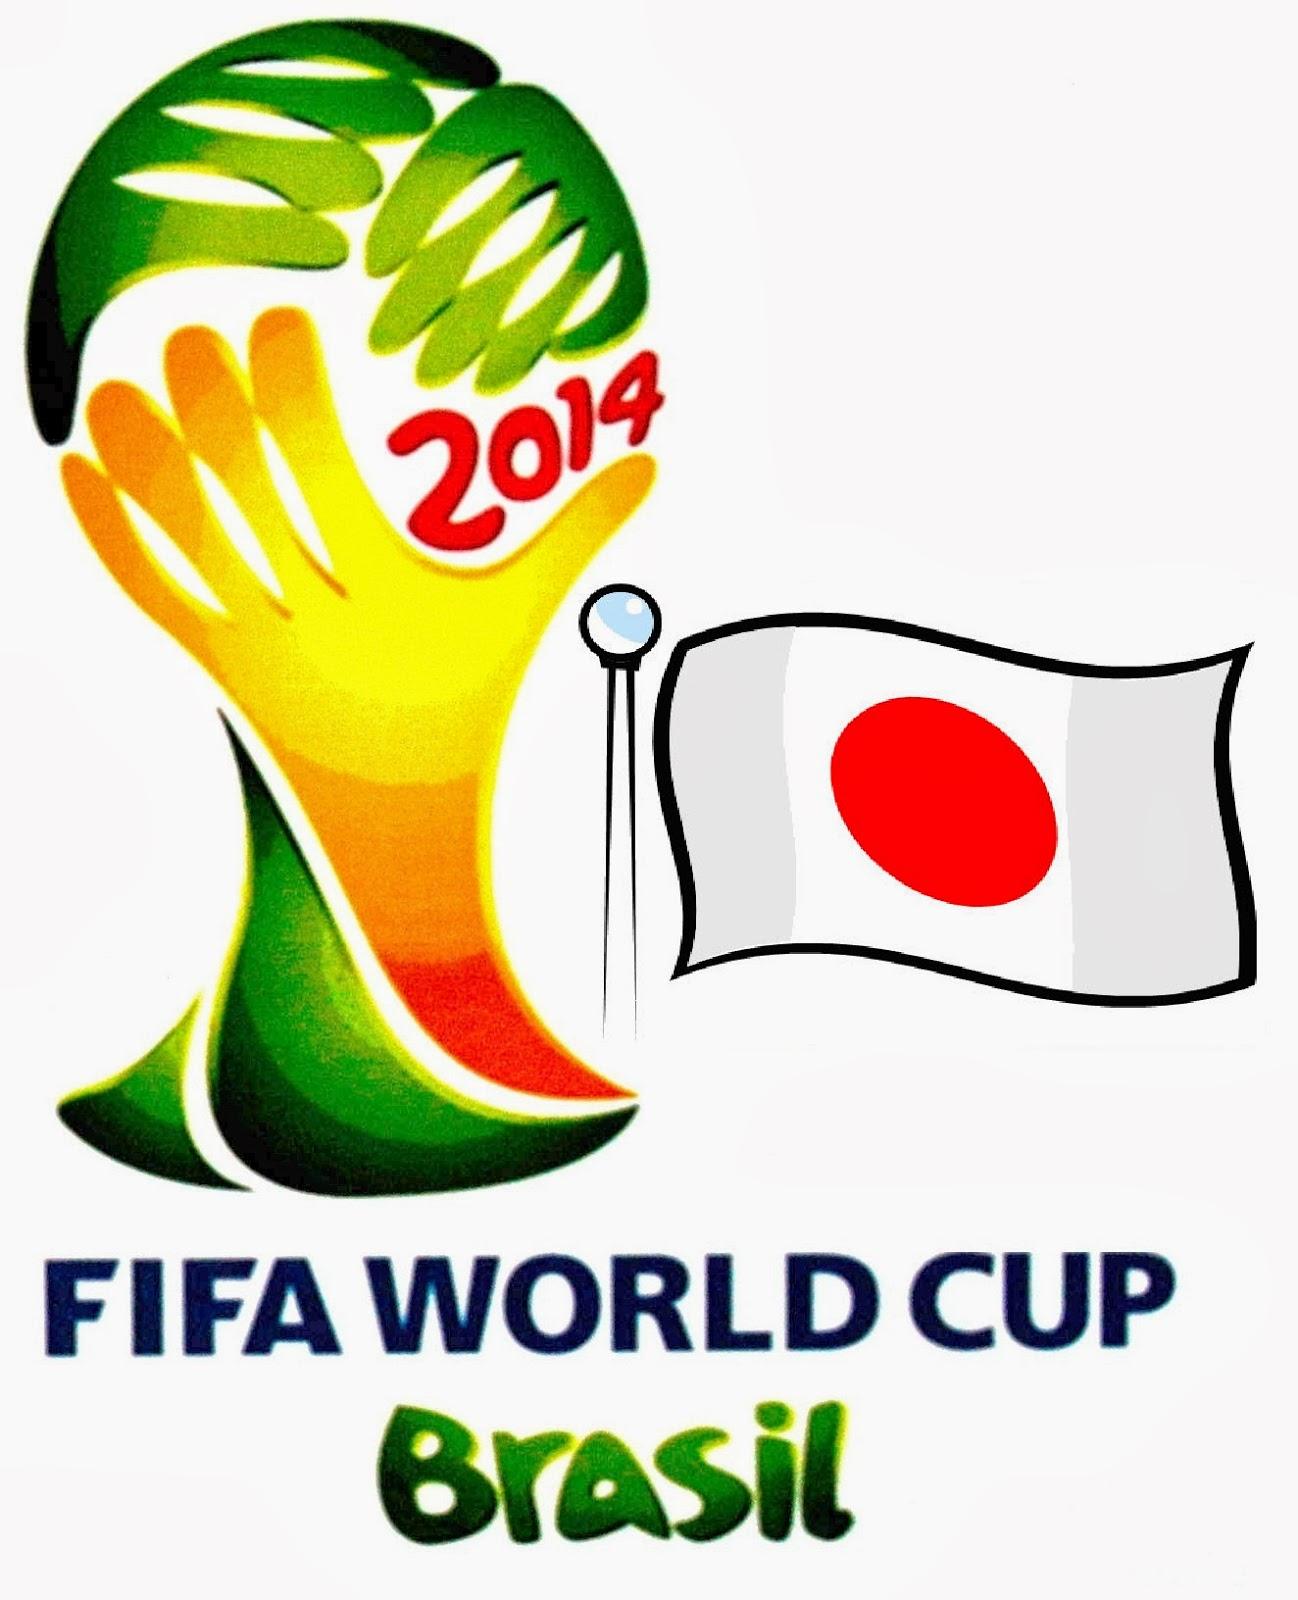 Daftar Nama Pemain Timnas Jepang Piala Dunia 2014